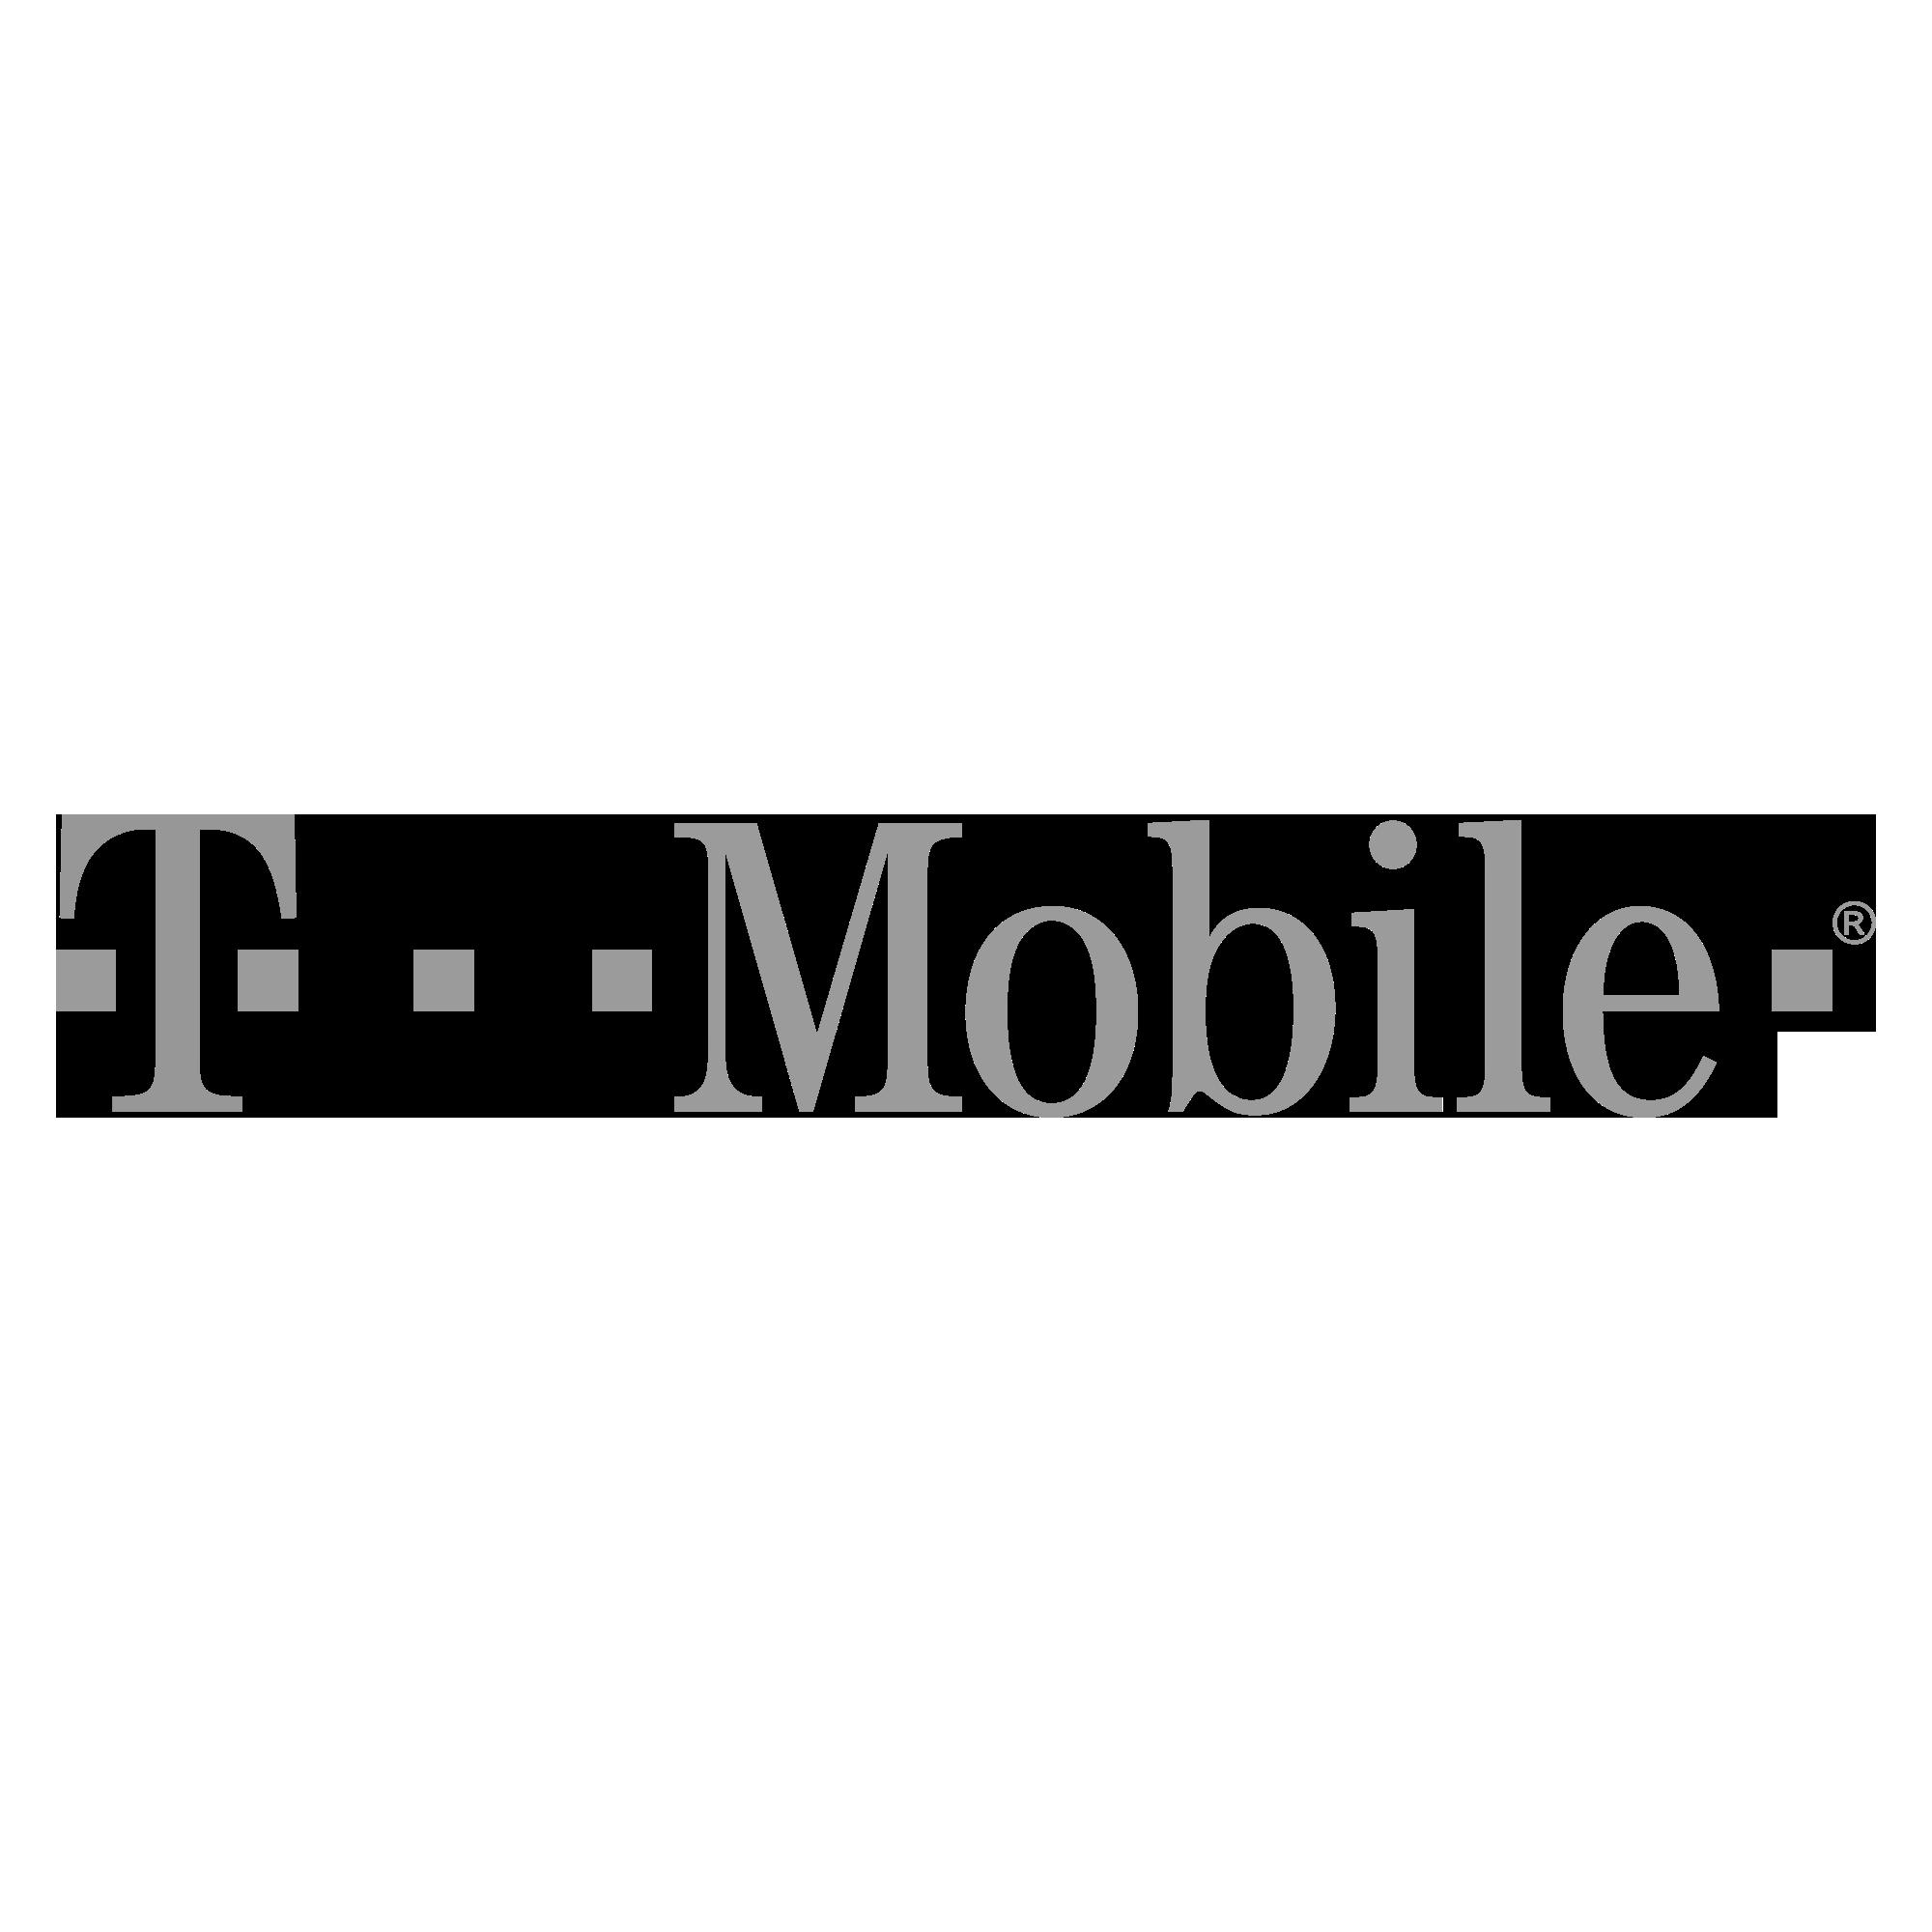 T Mobile copy